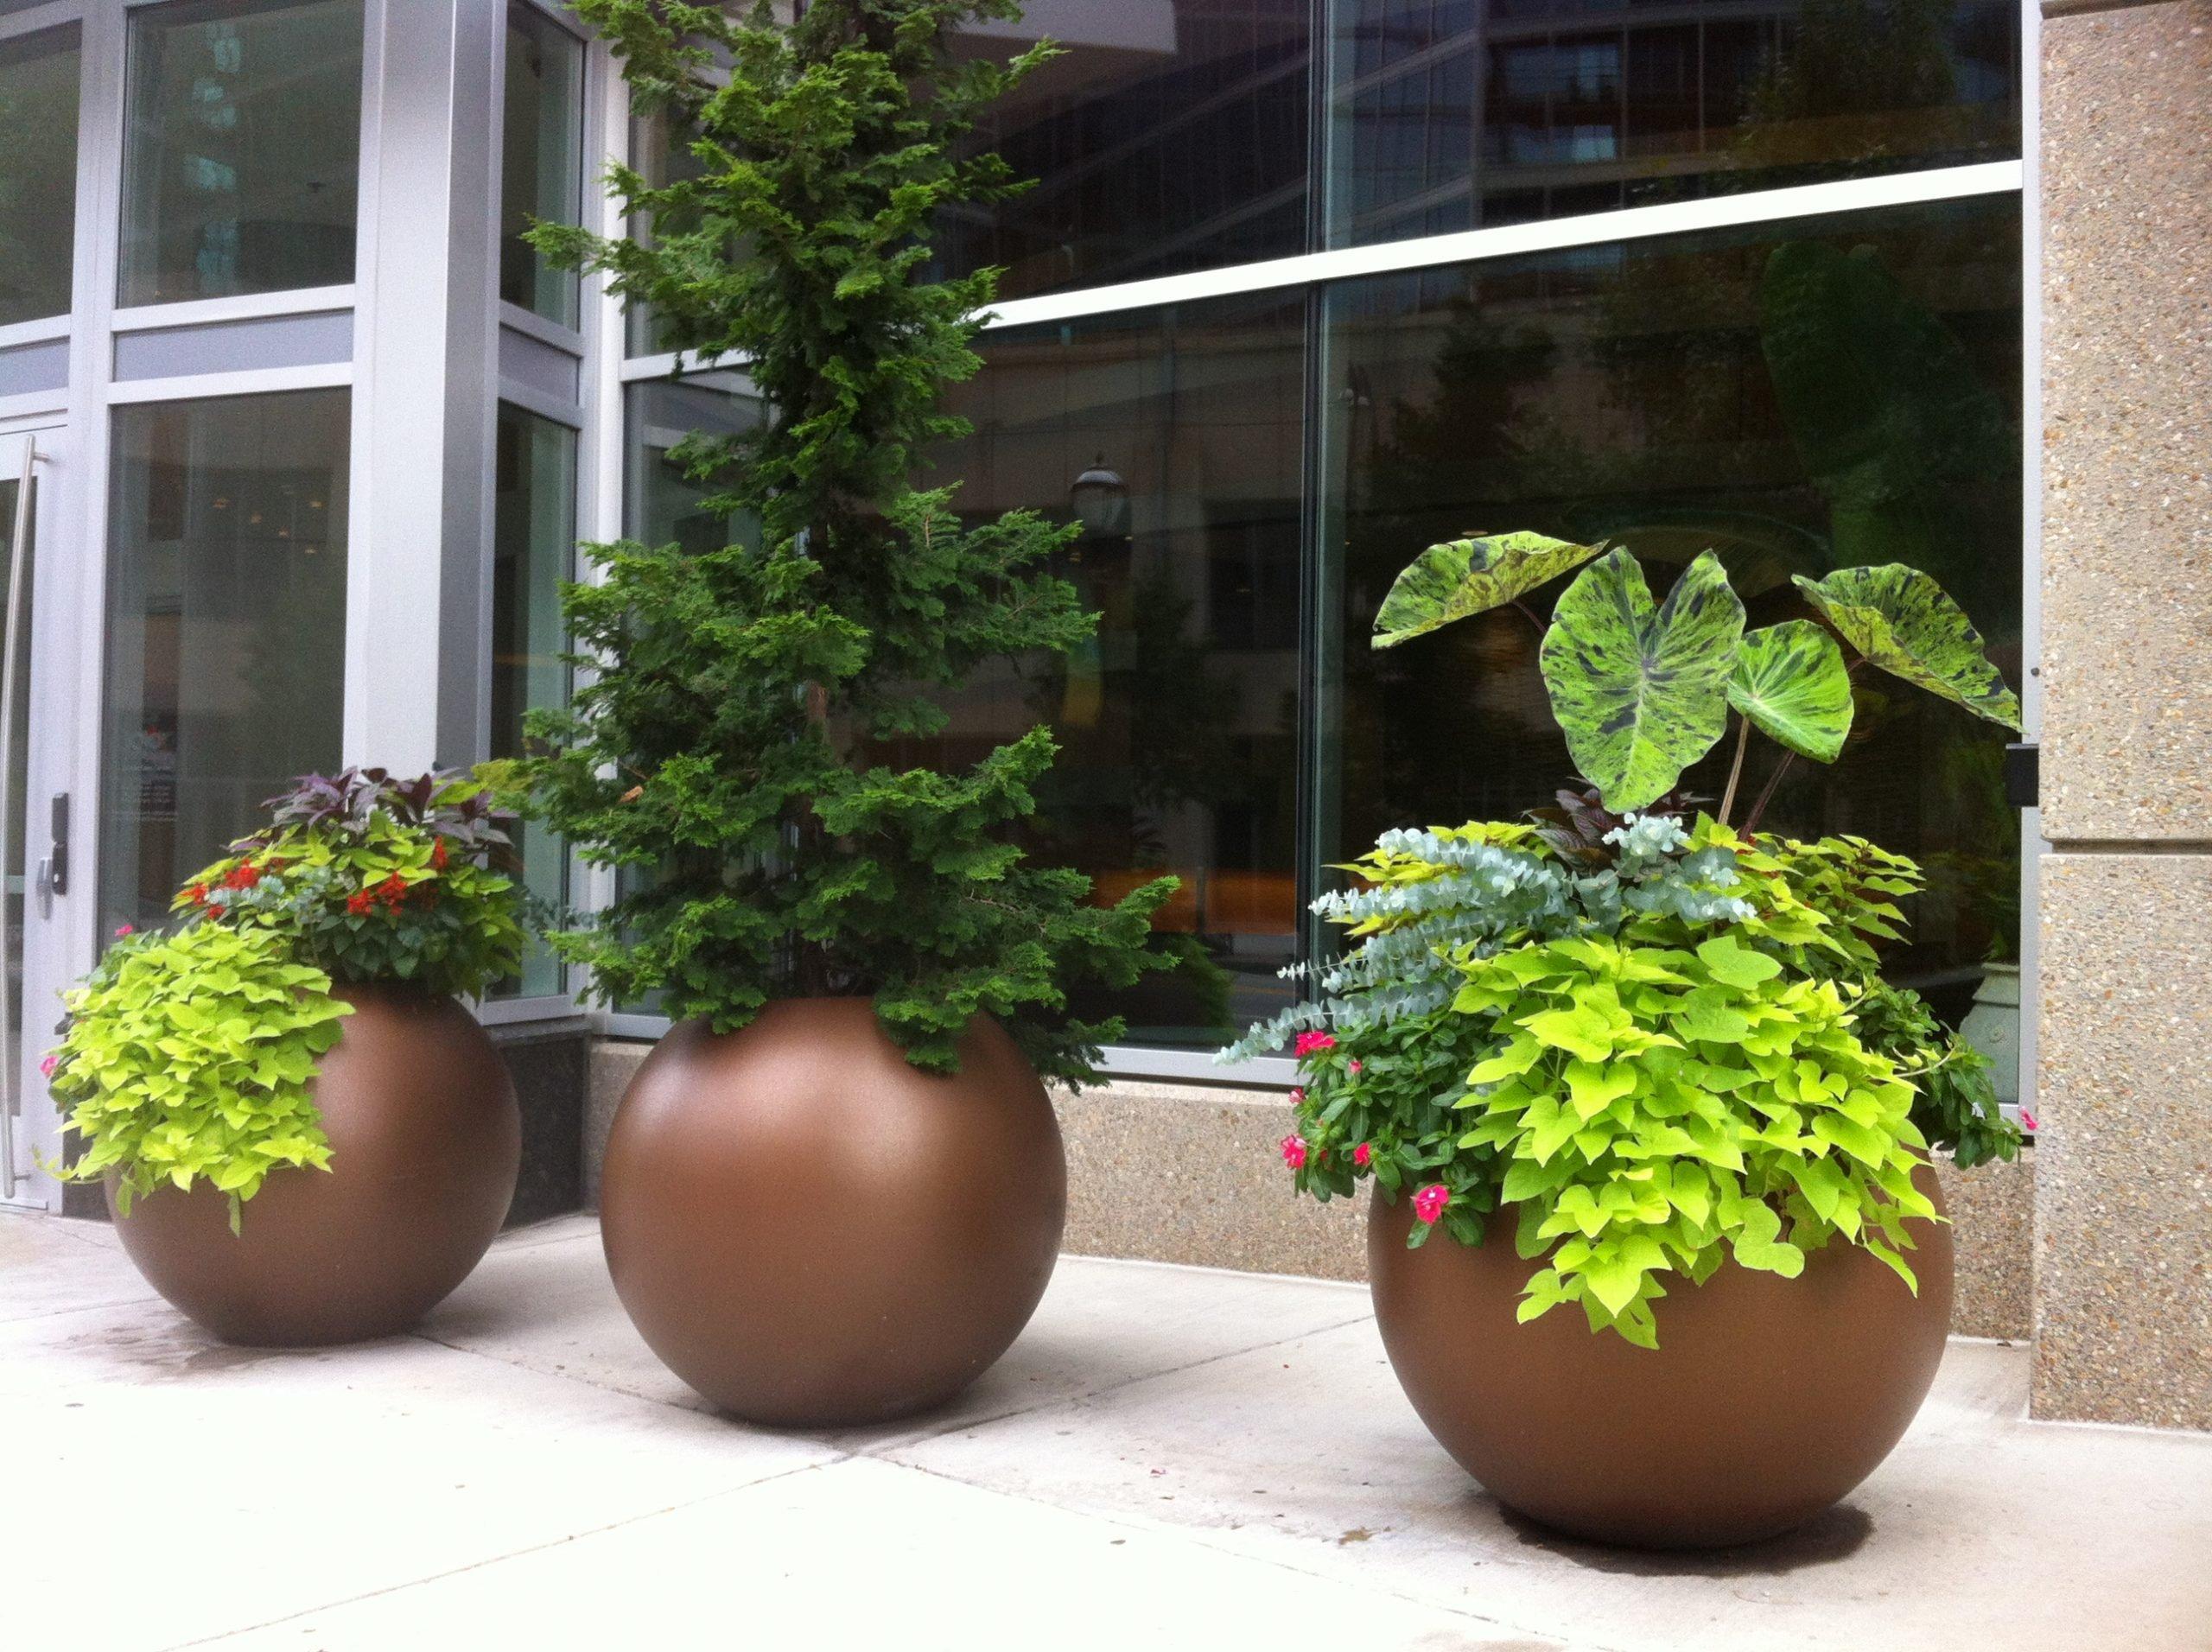 3 golden brown globular planters outdoors